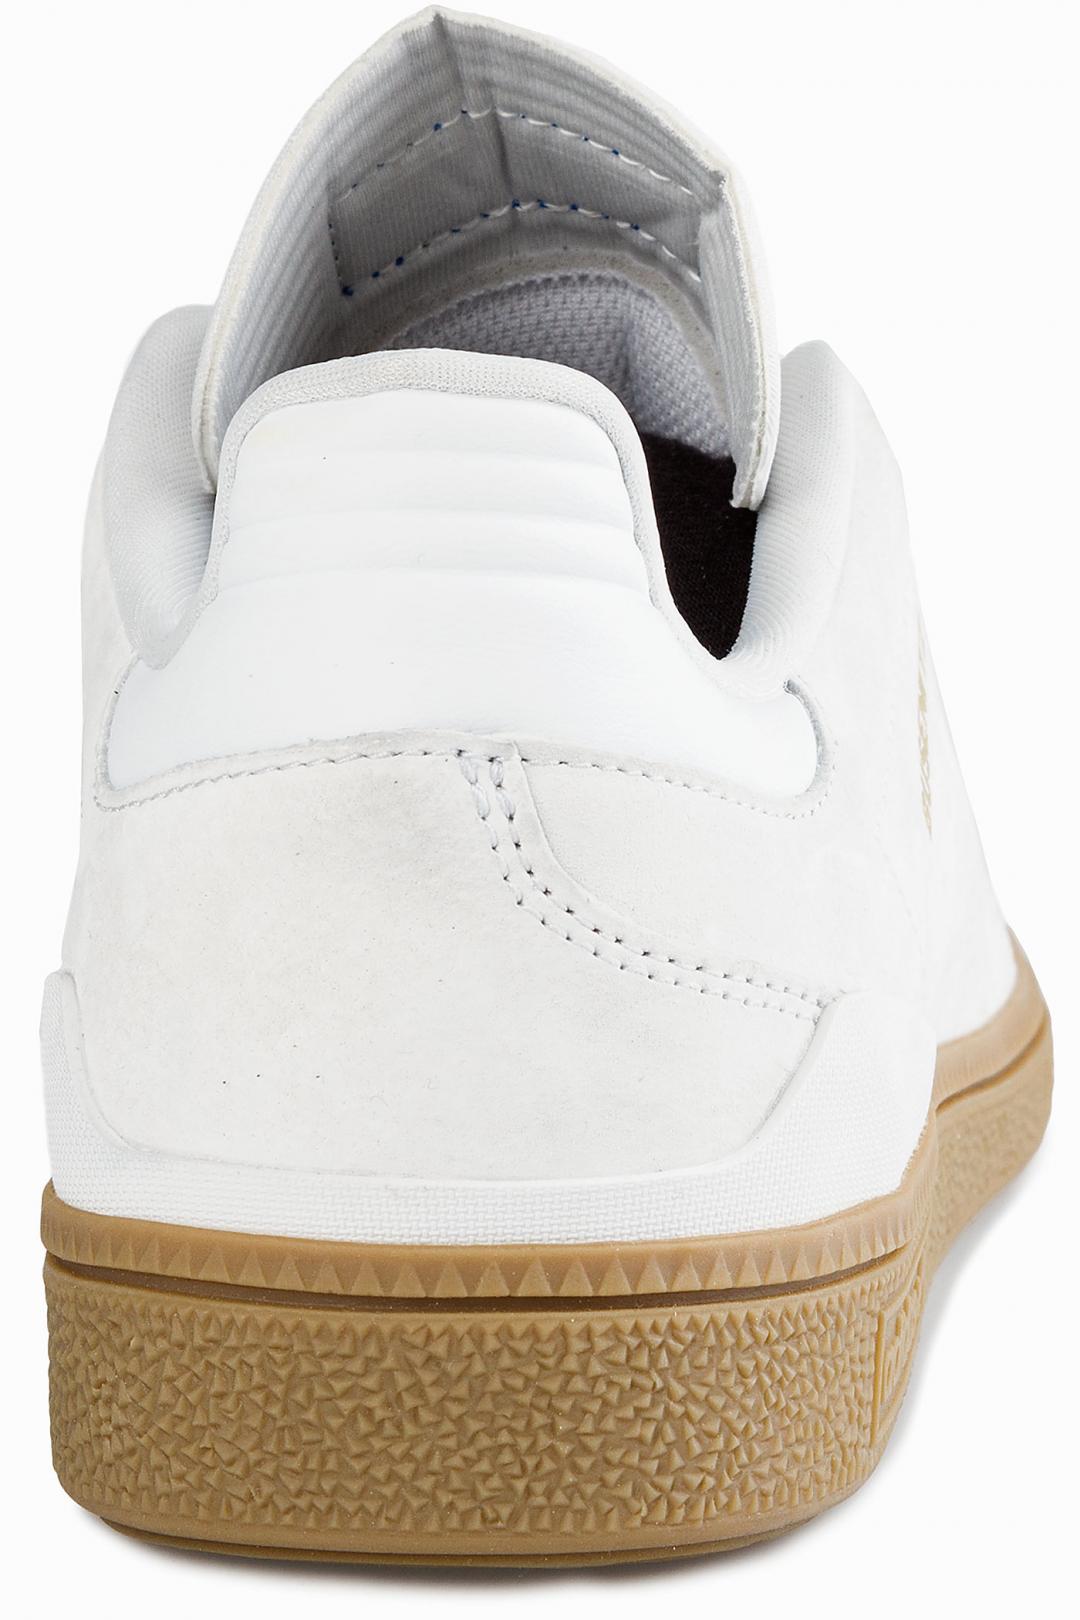 Uomo adidas Skateboarding Busenitz RX white gum gold | Scarpe da skate